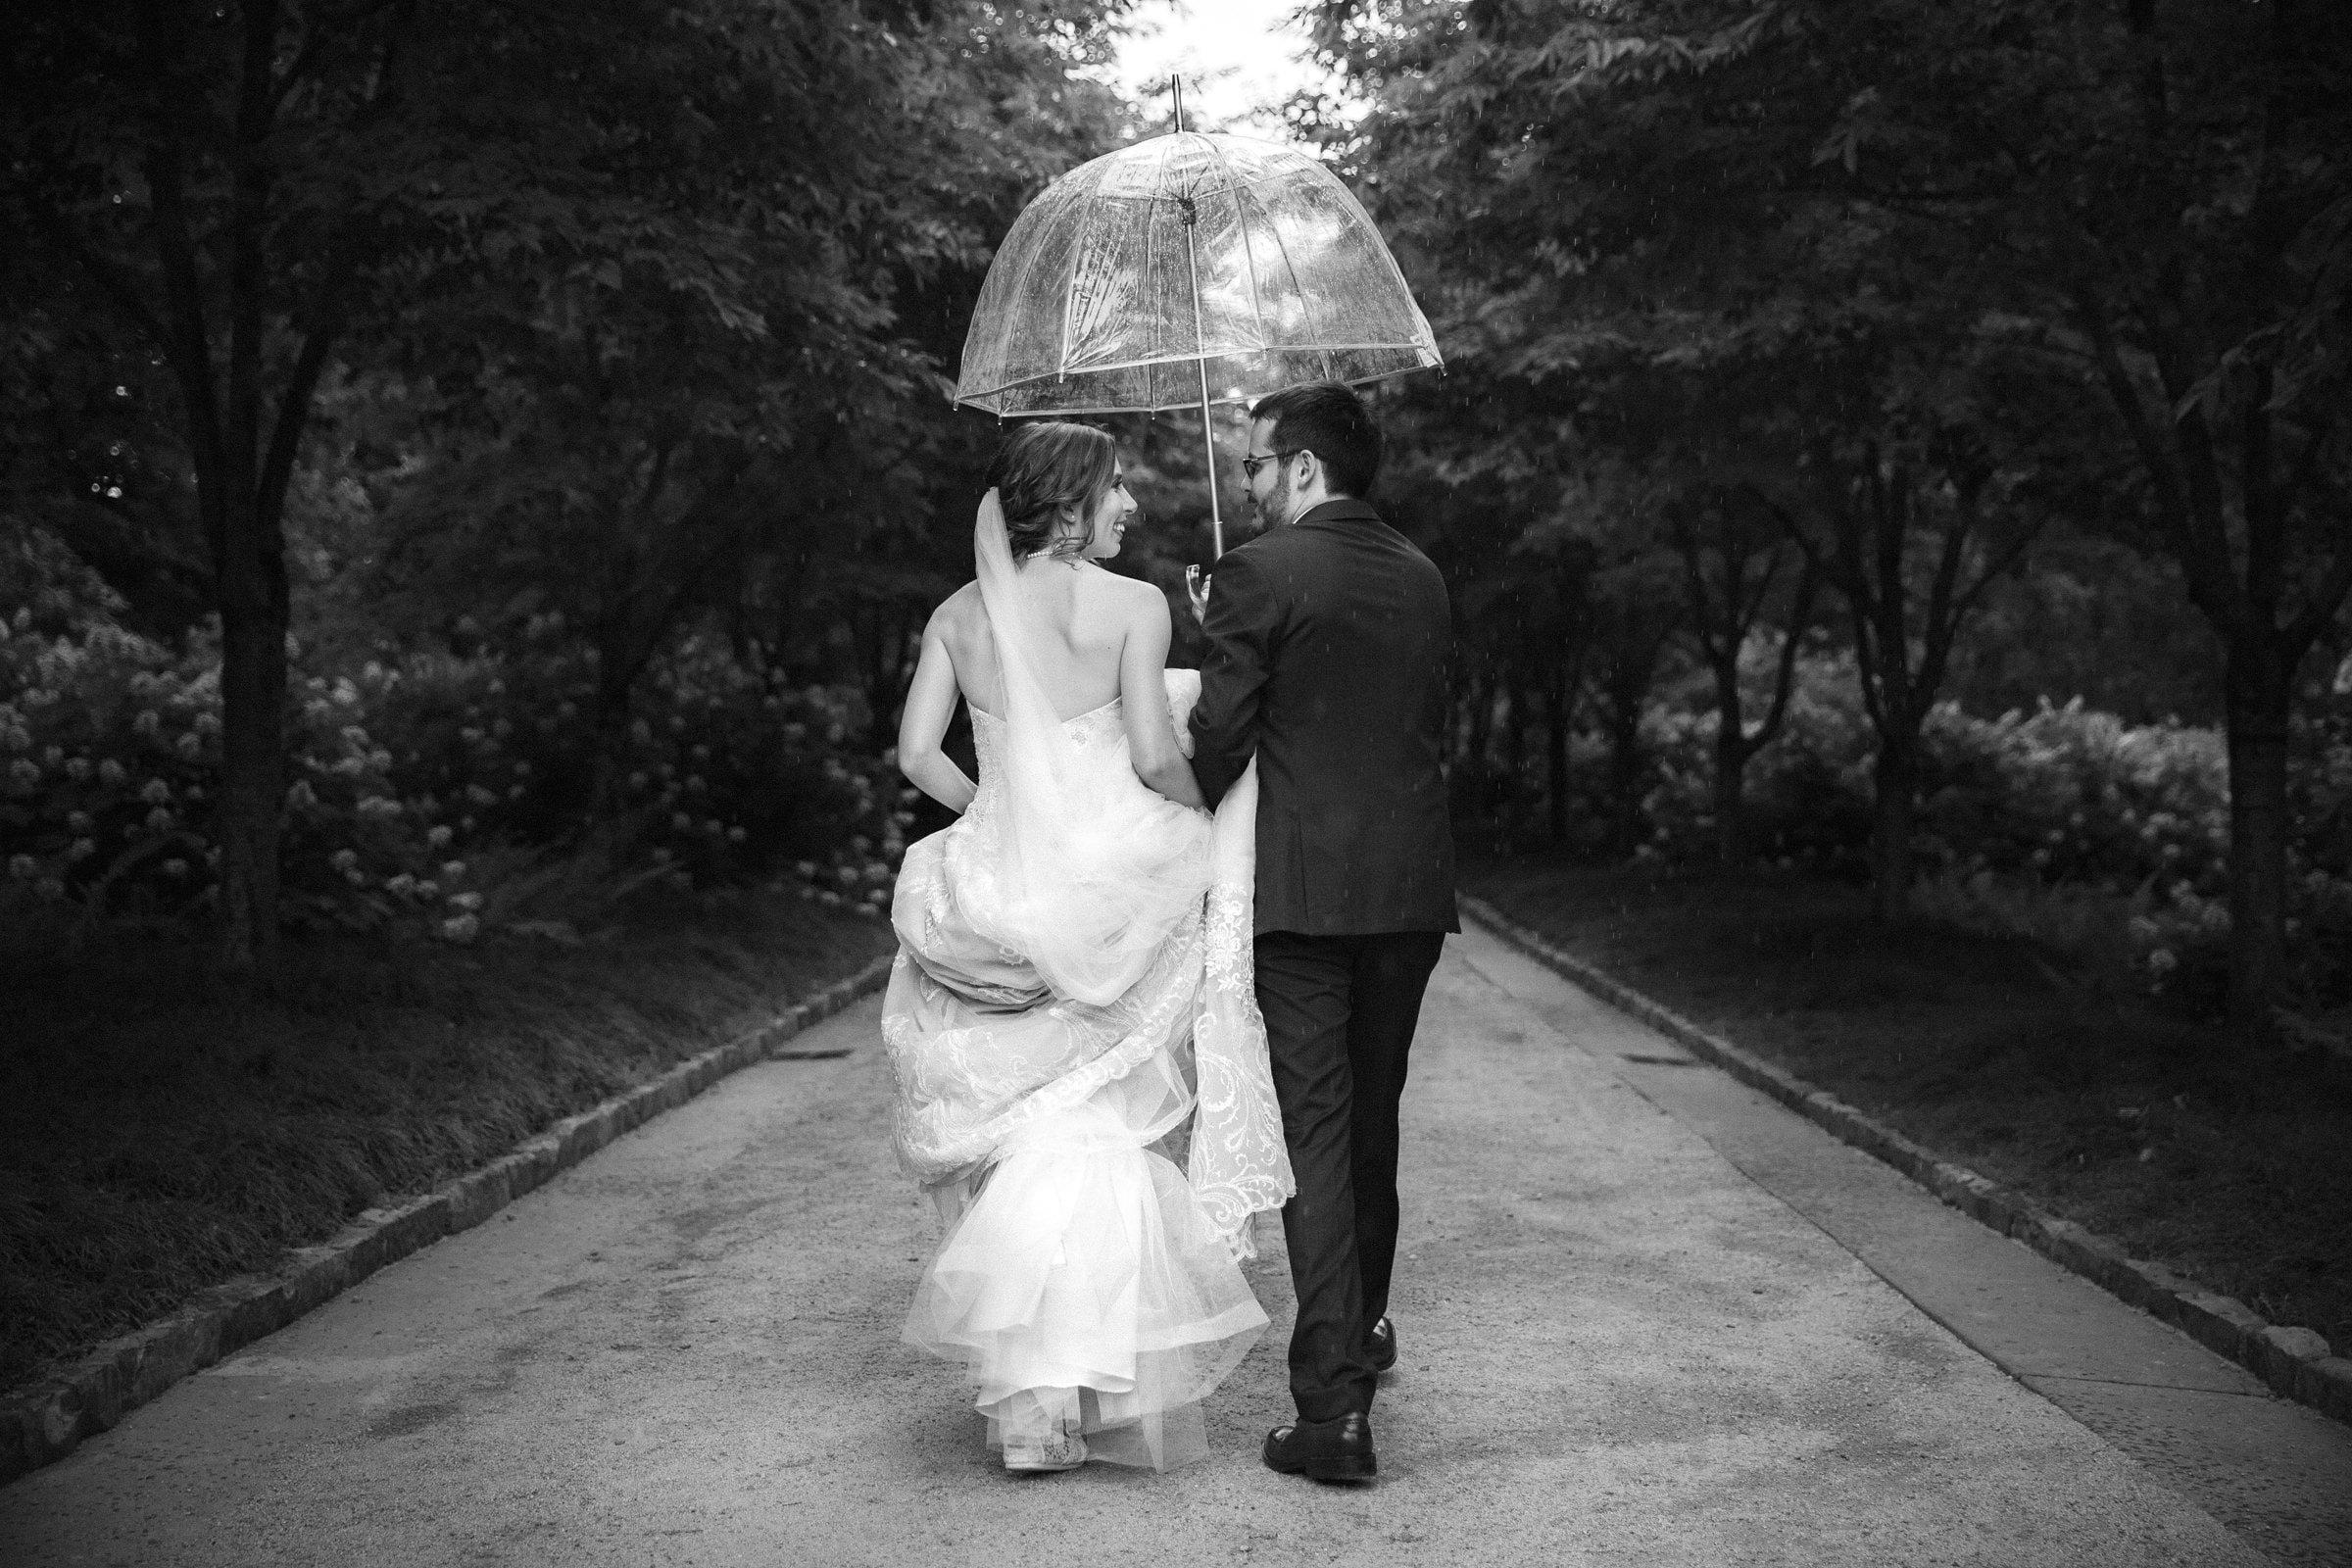 Duke Chapel Wedding Photography - Bride and Groom First Look at Duke Gardens B&W